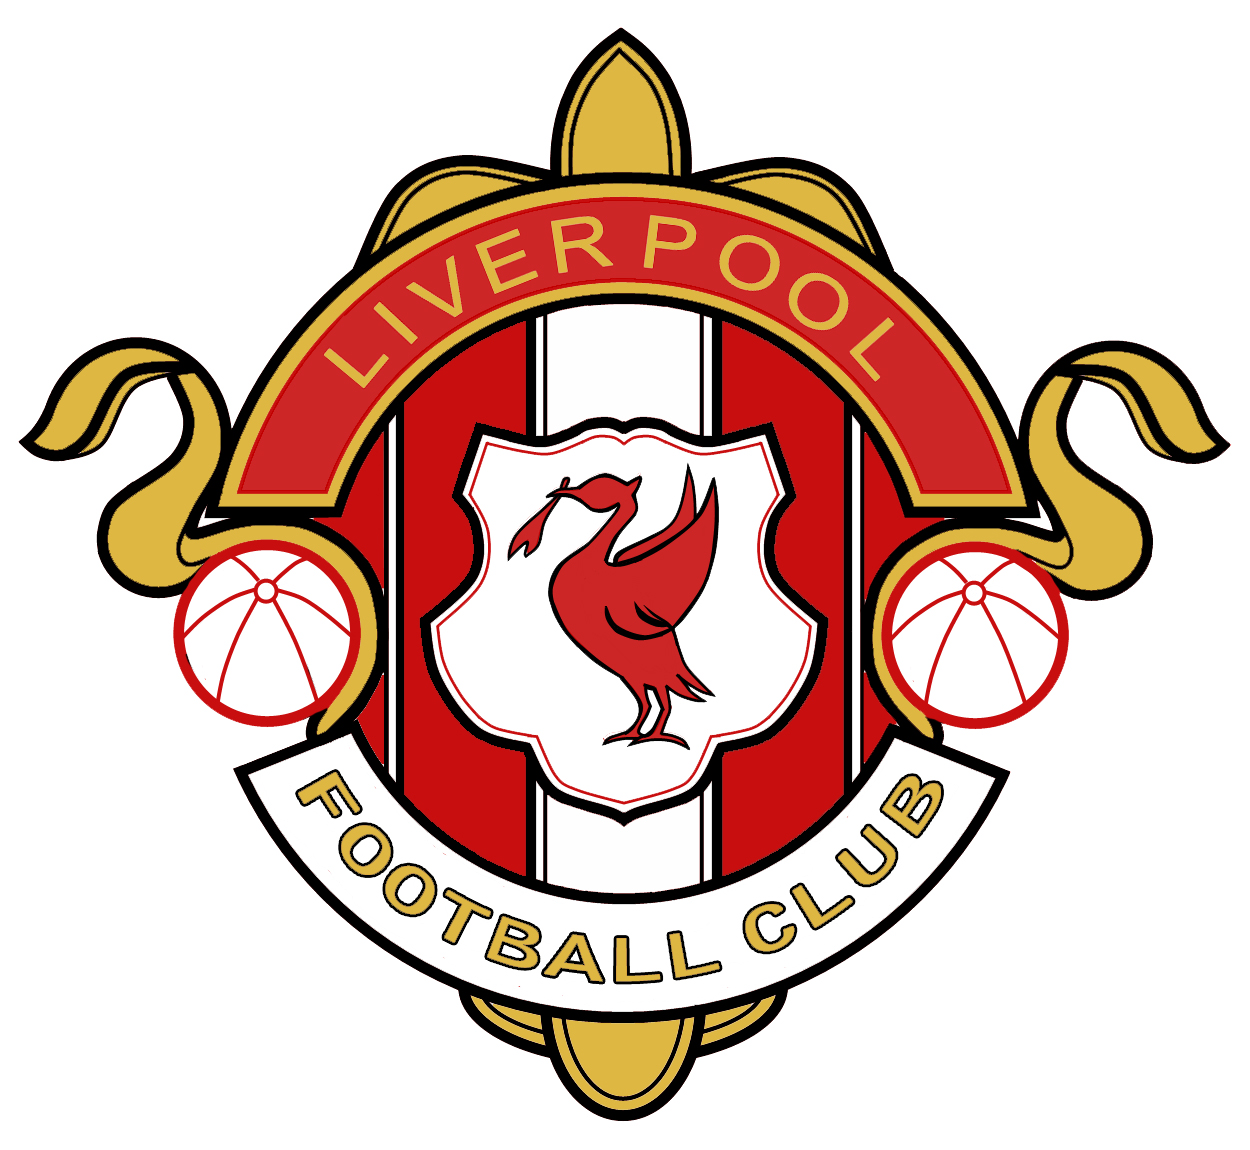 liverpool crest history: June 2011